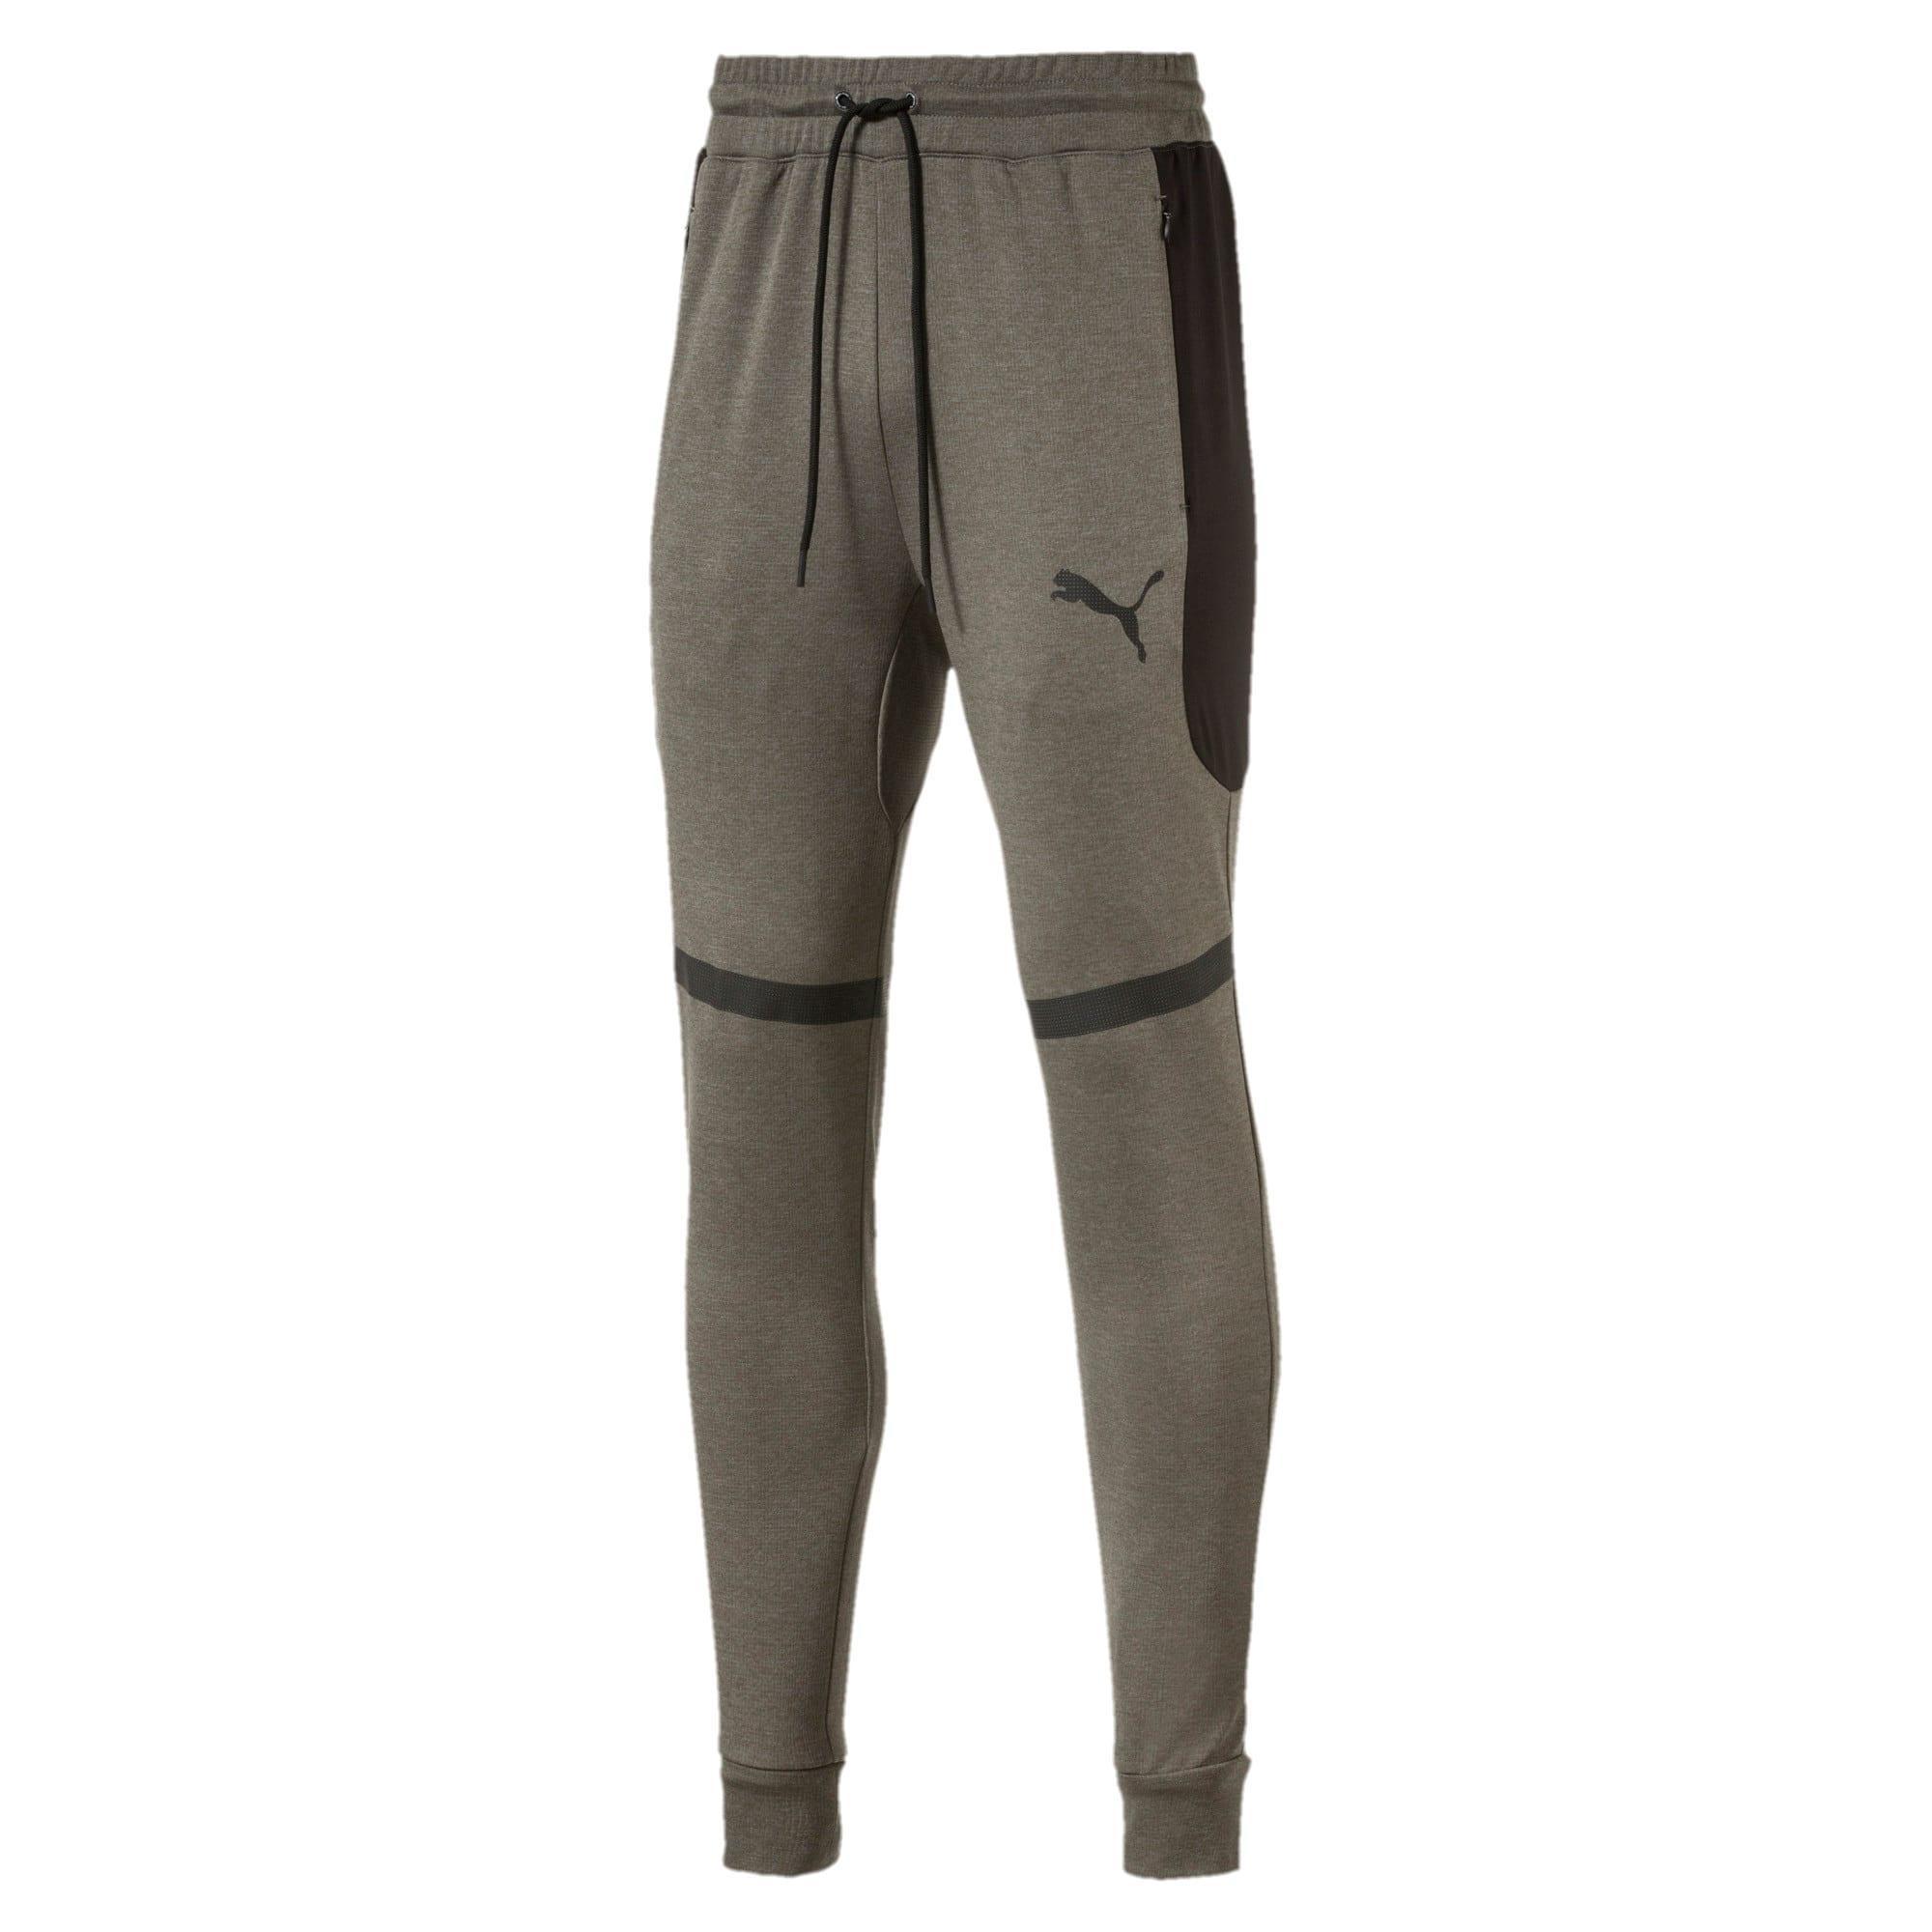 Thumbnail 1 of Trackster Men's Tech Sweatpants, Castor Gray Heather, medium-IND